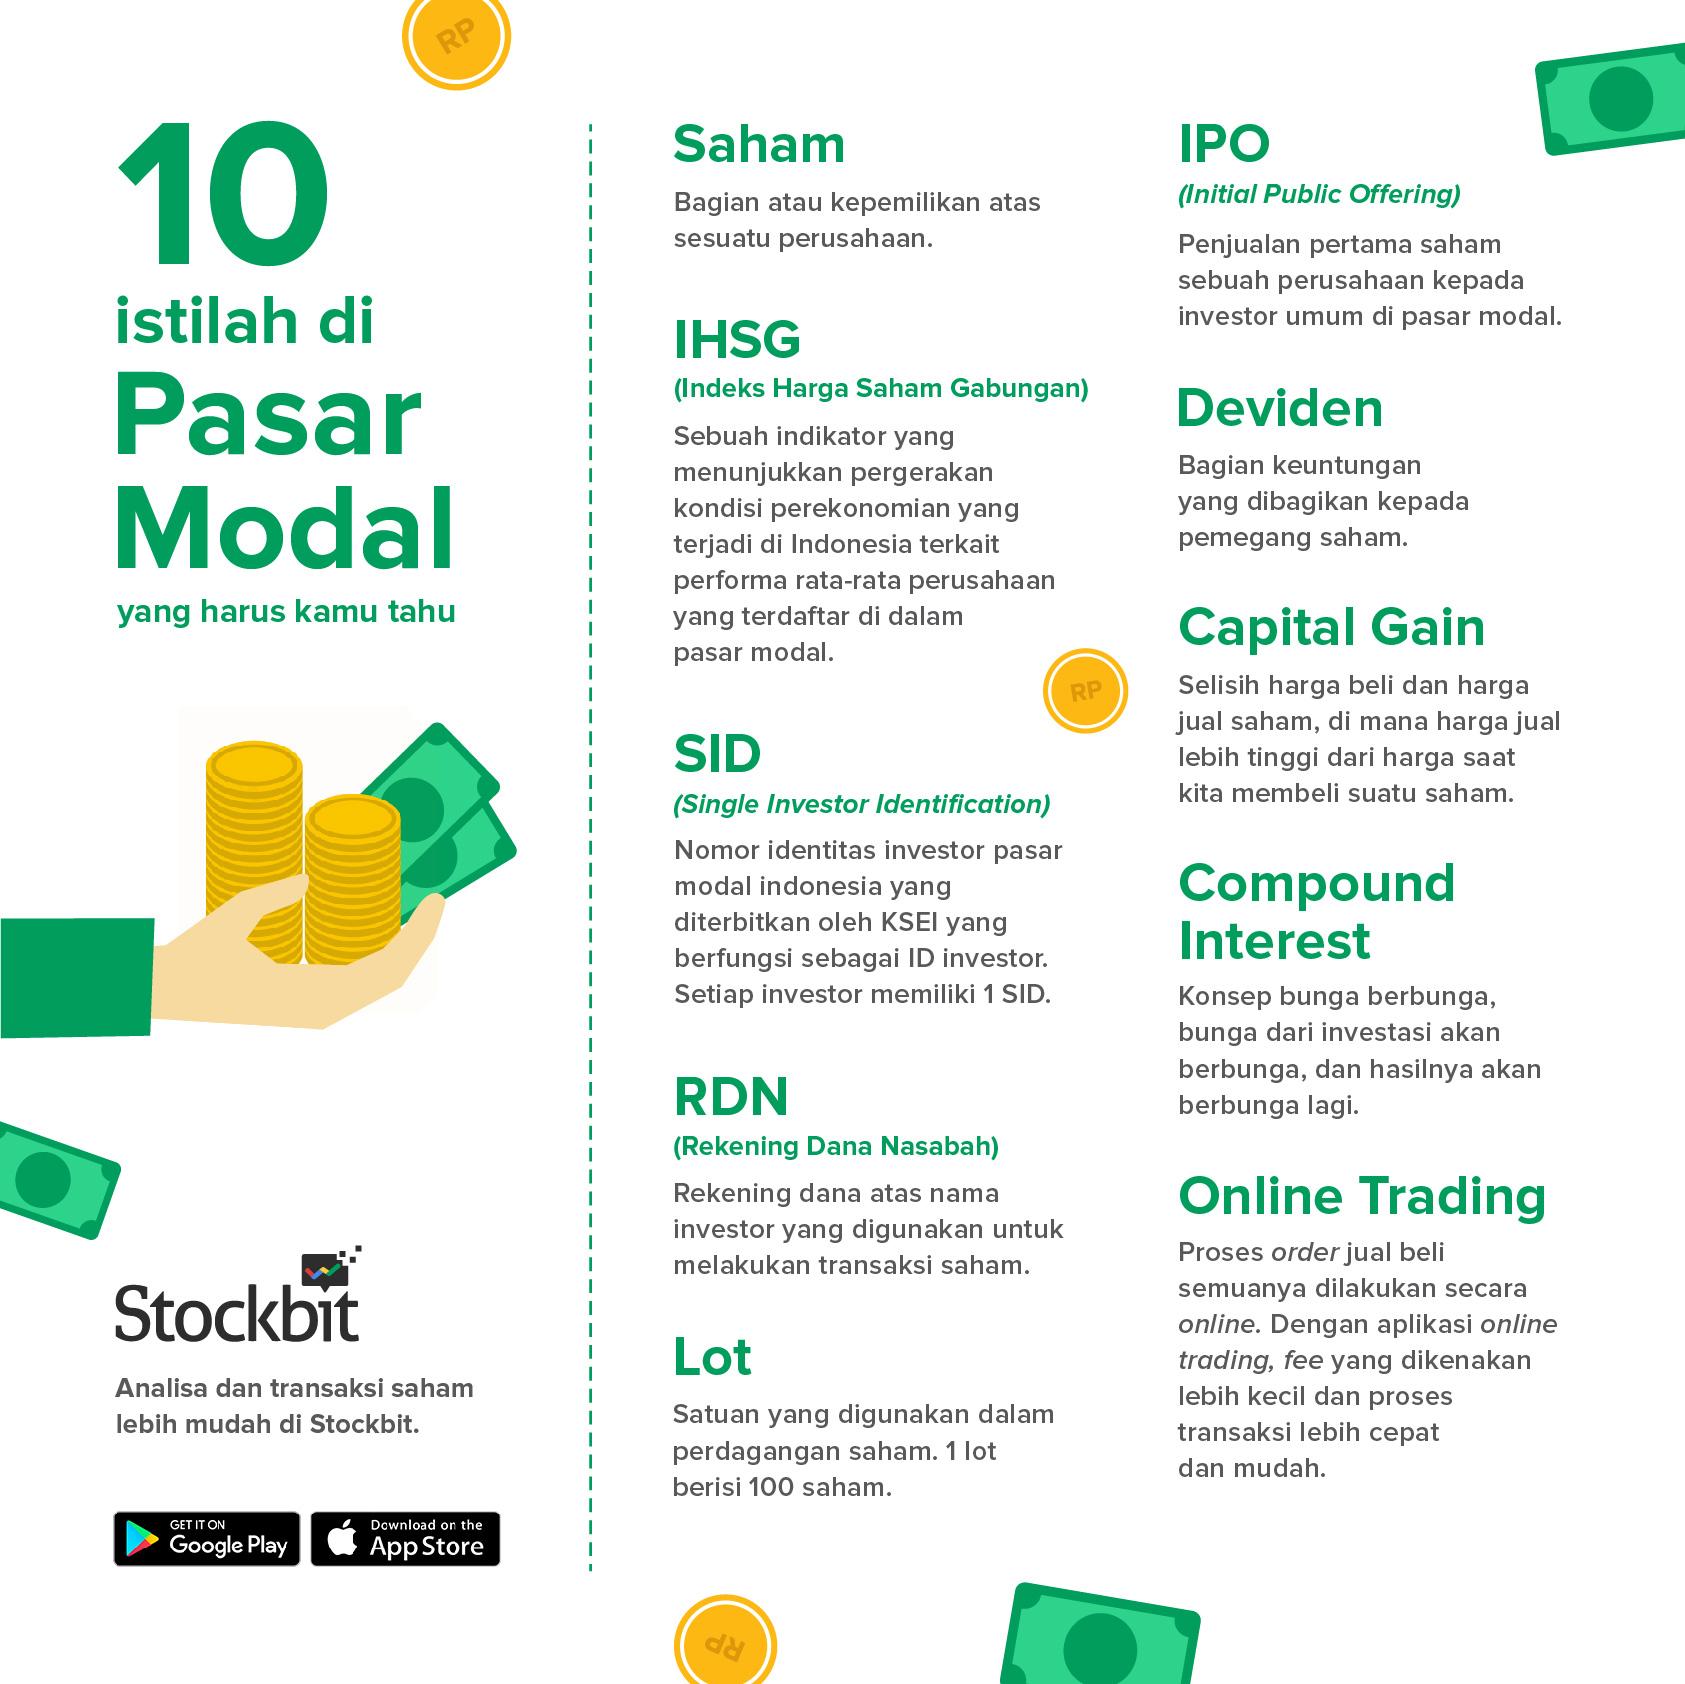 10 istilah di pasar modal